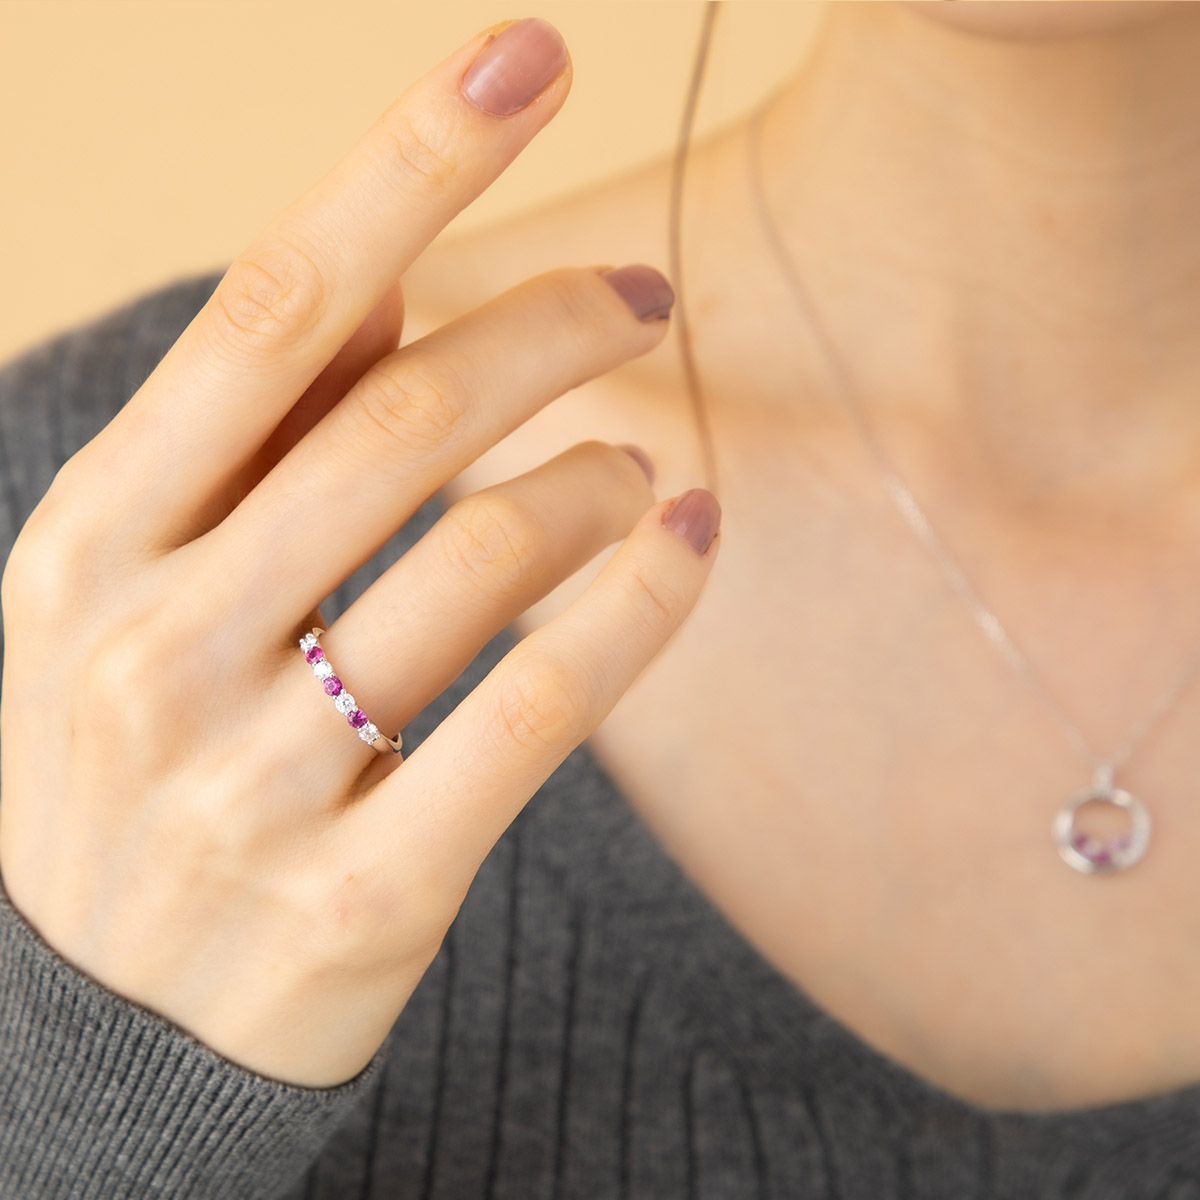 Pt900 ルビー×ダイヤモンド 一文字リング